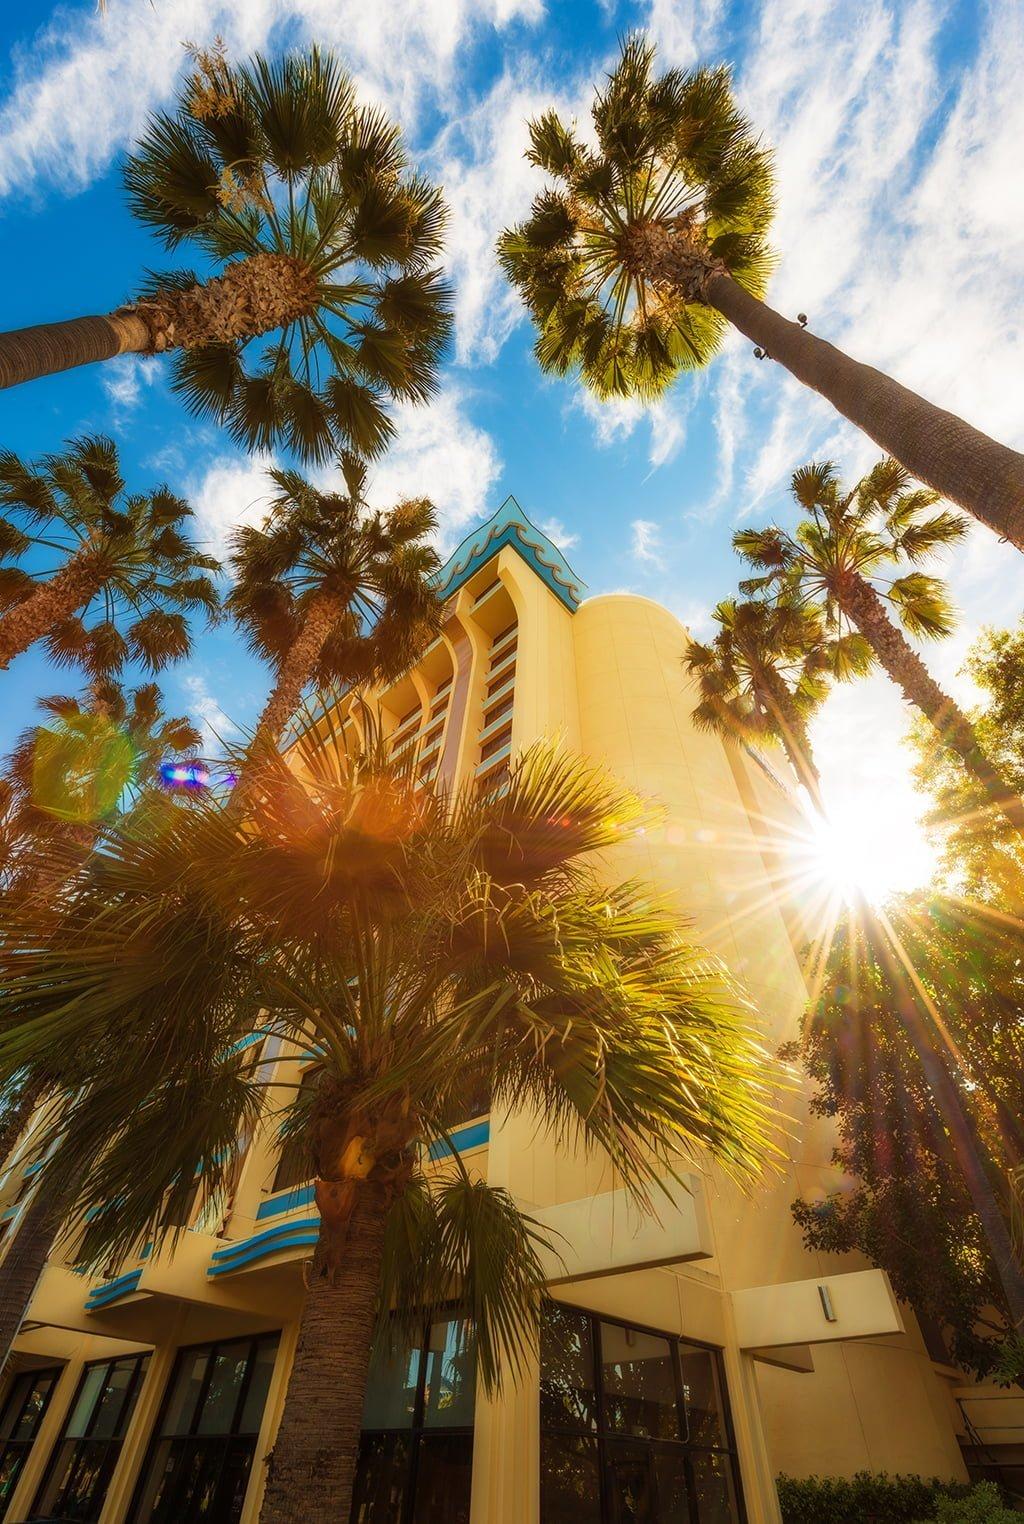 disneyland paradise pier hotels